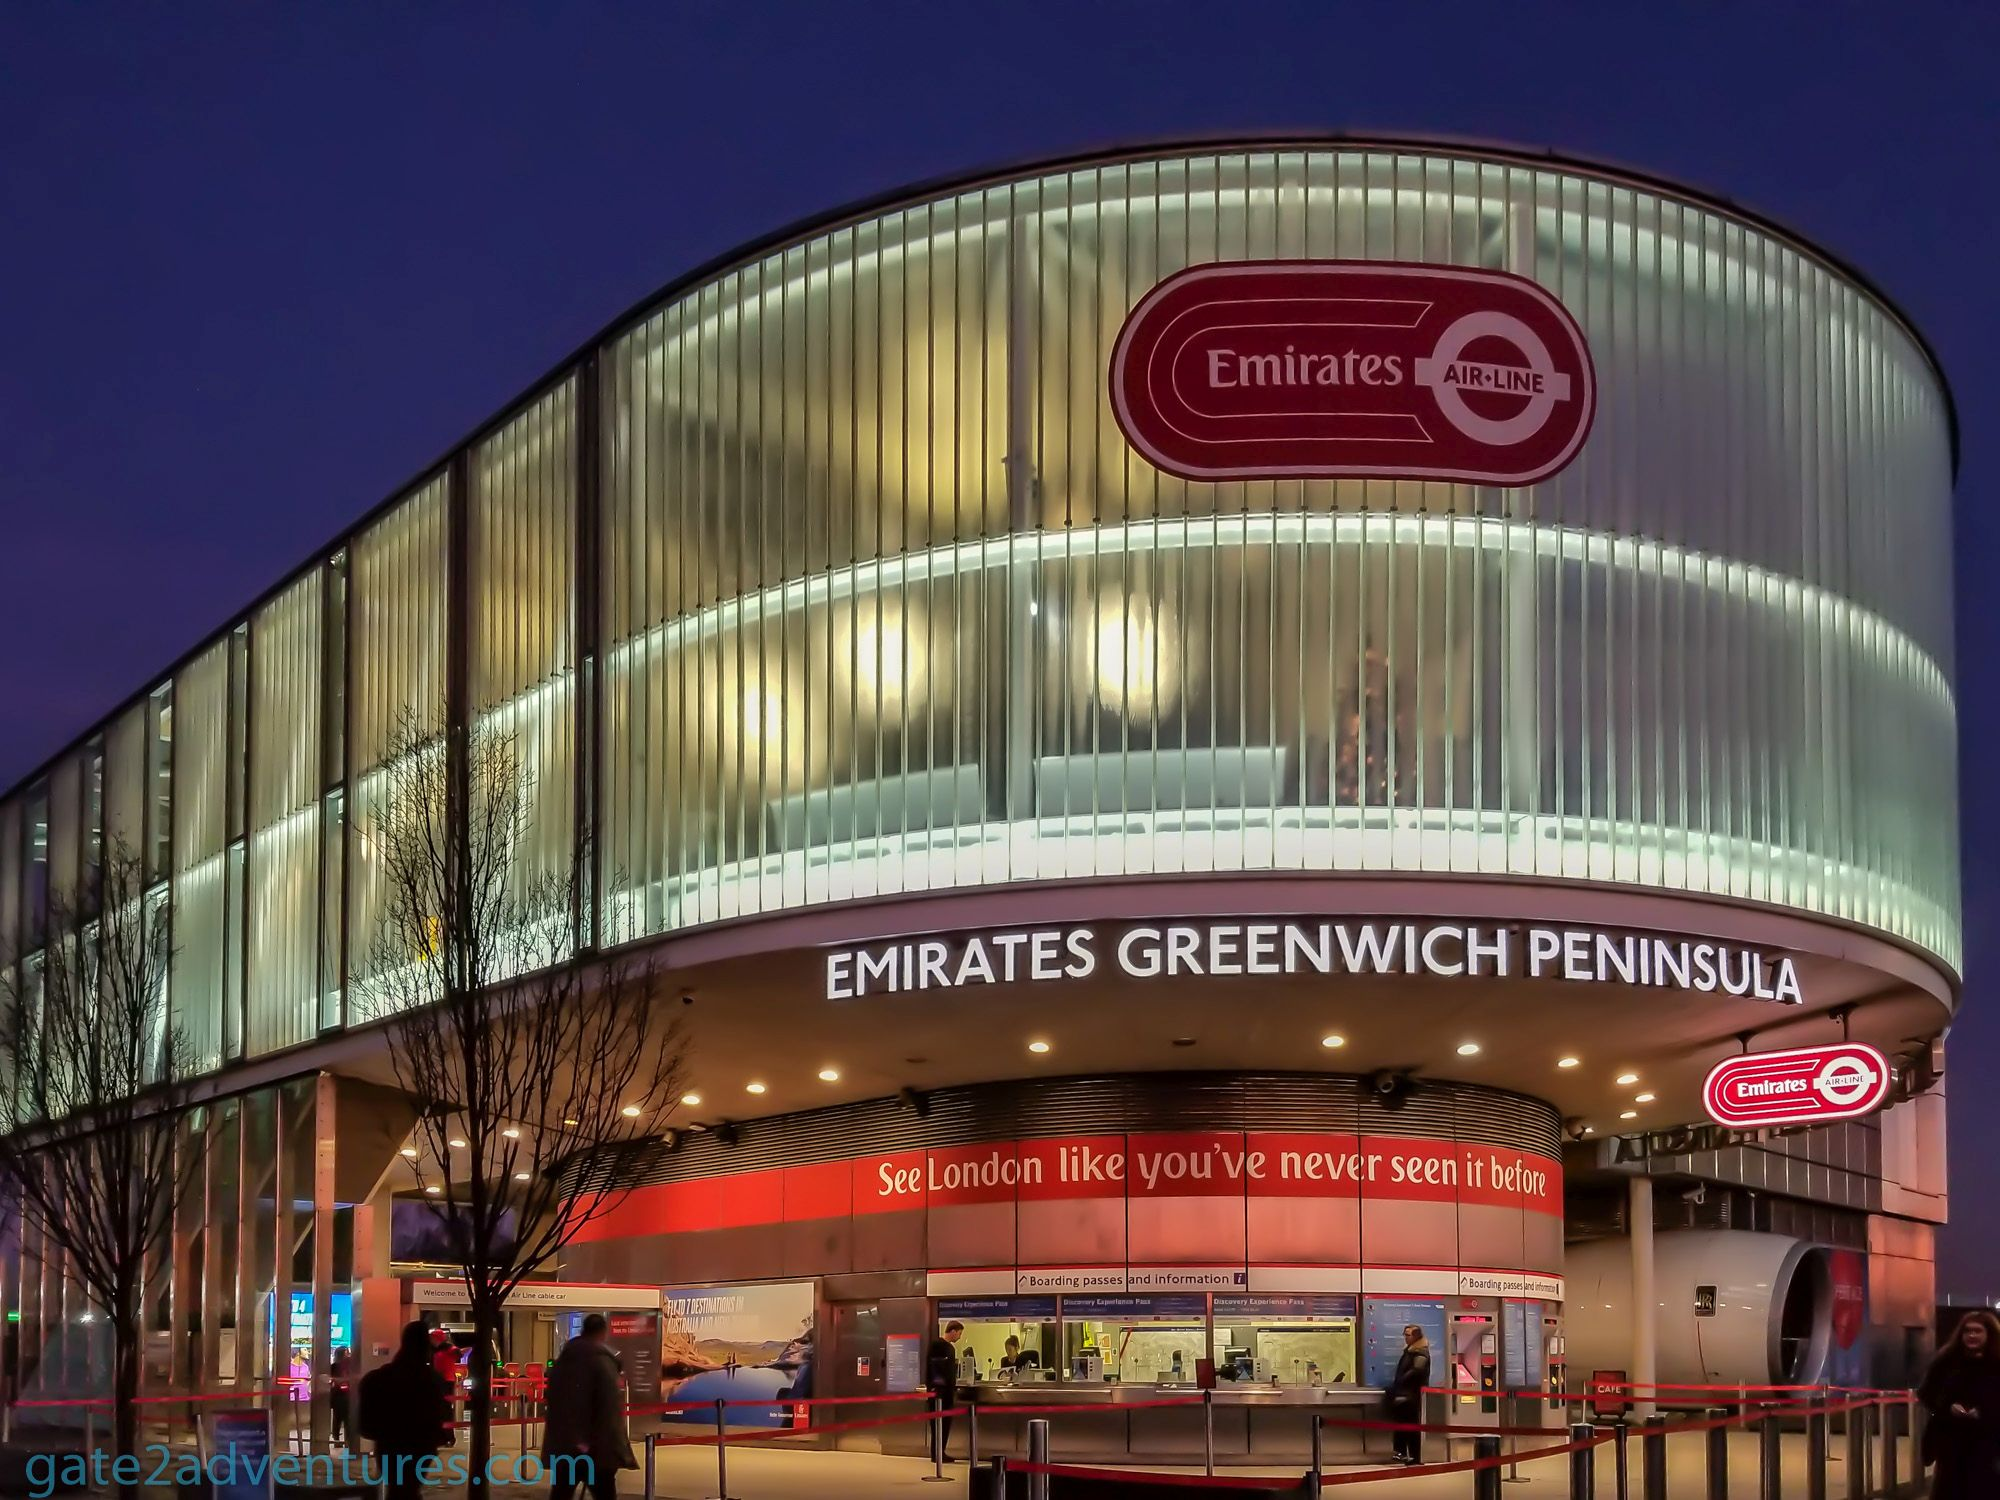 Emirates Air Line London